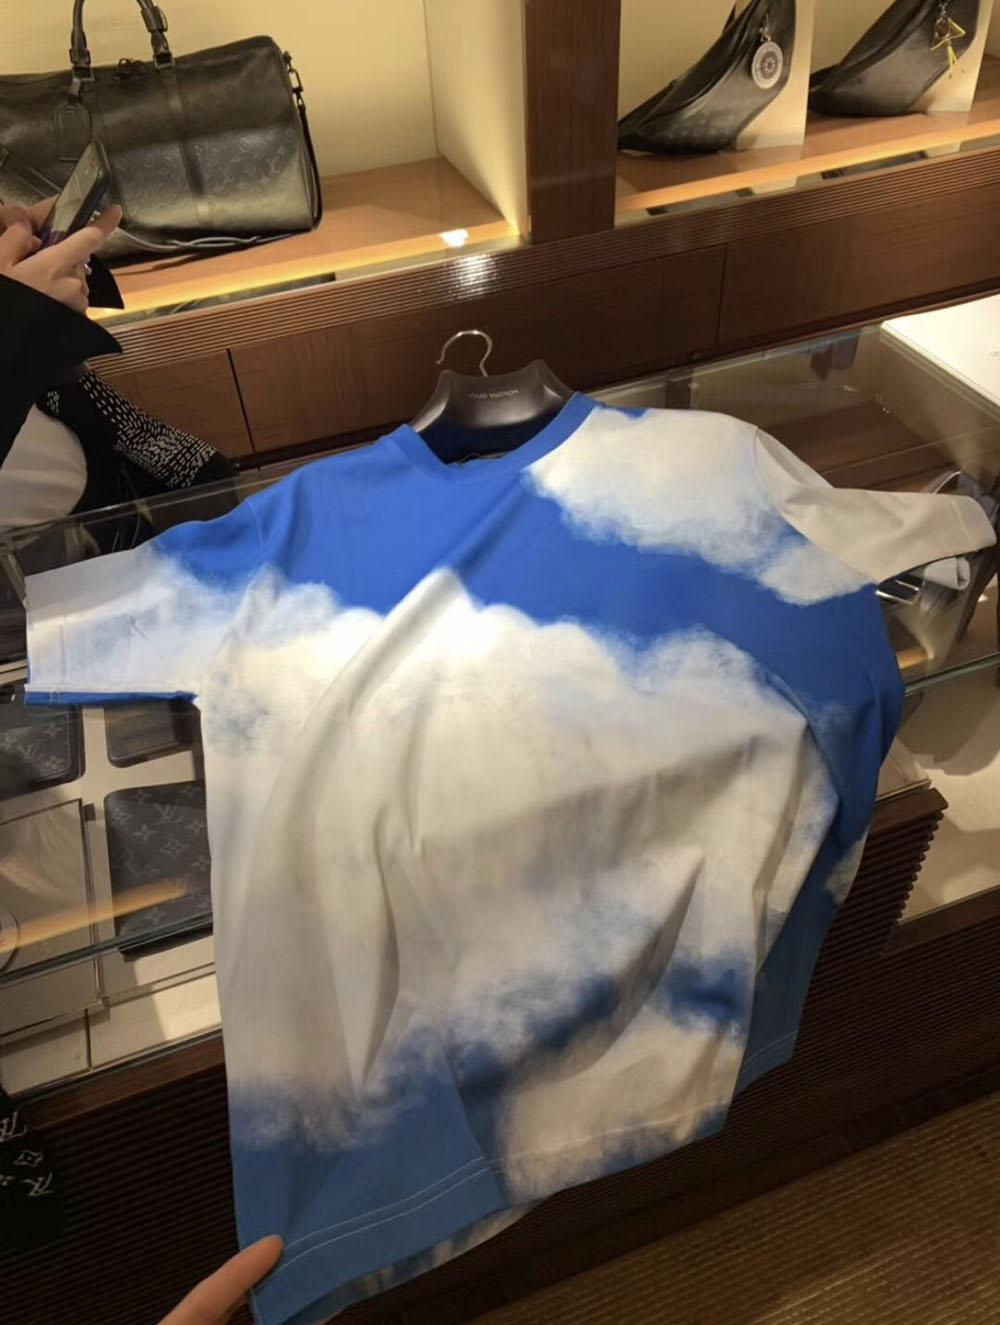 Mens Camisetas Pólos Mulheres 20s Hip Hop Street Moda Manga Curta Para Mulheres Top Tees Casuais Impressão Hiphop Homens Descansar Shorts Tops PoloShirt Cloud